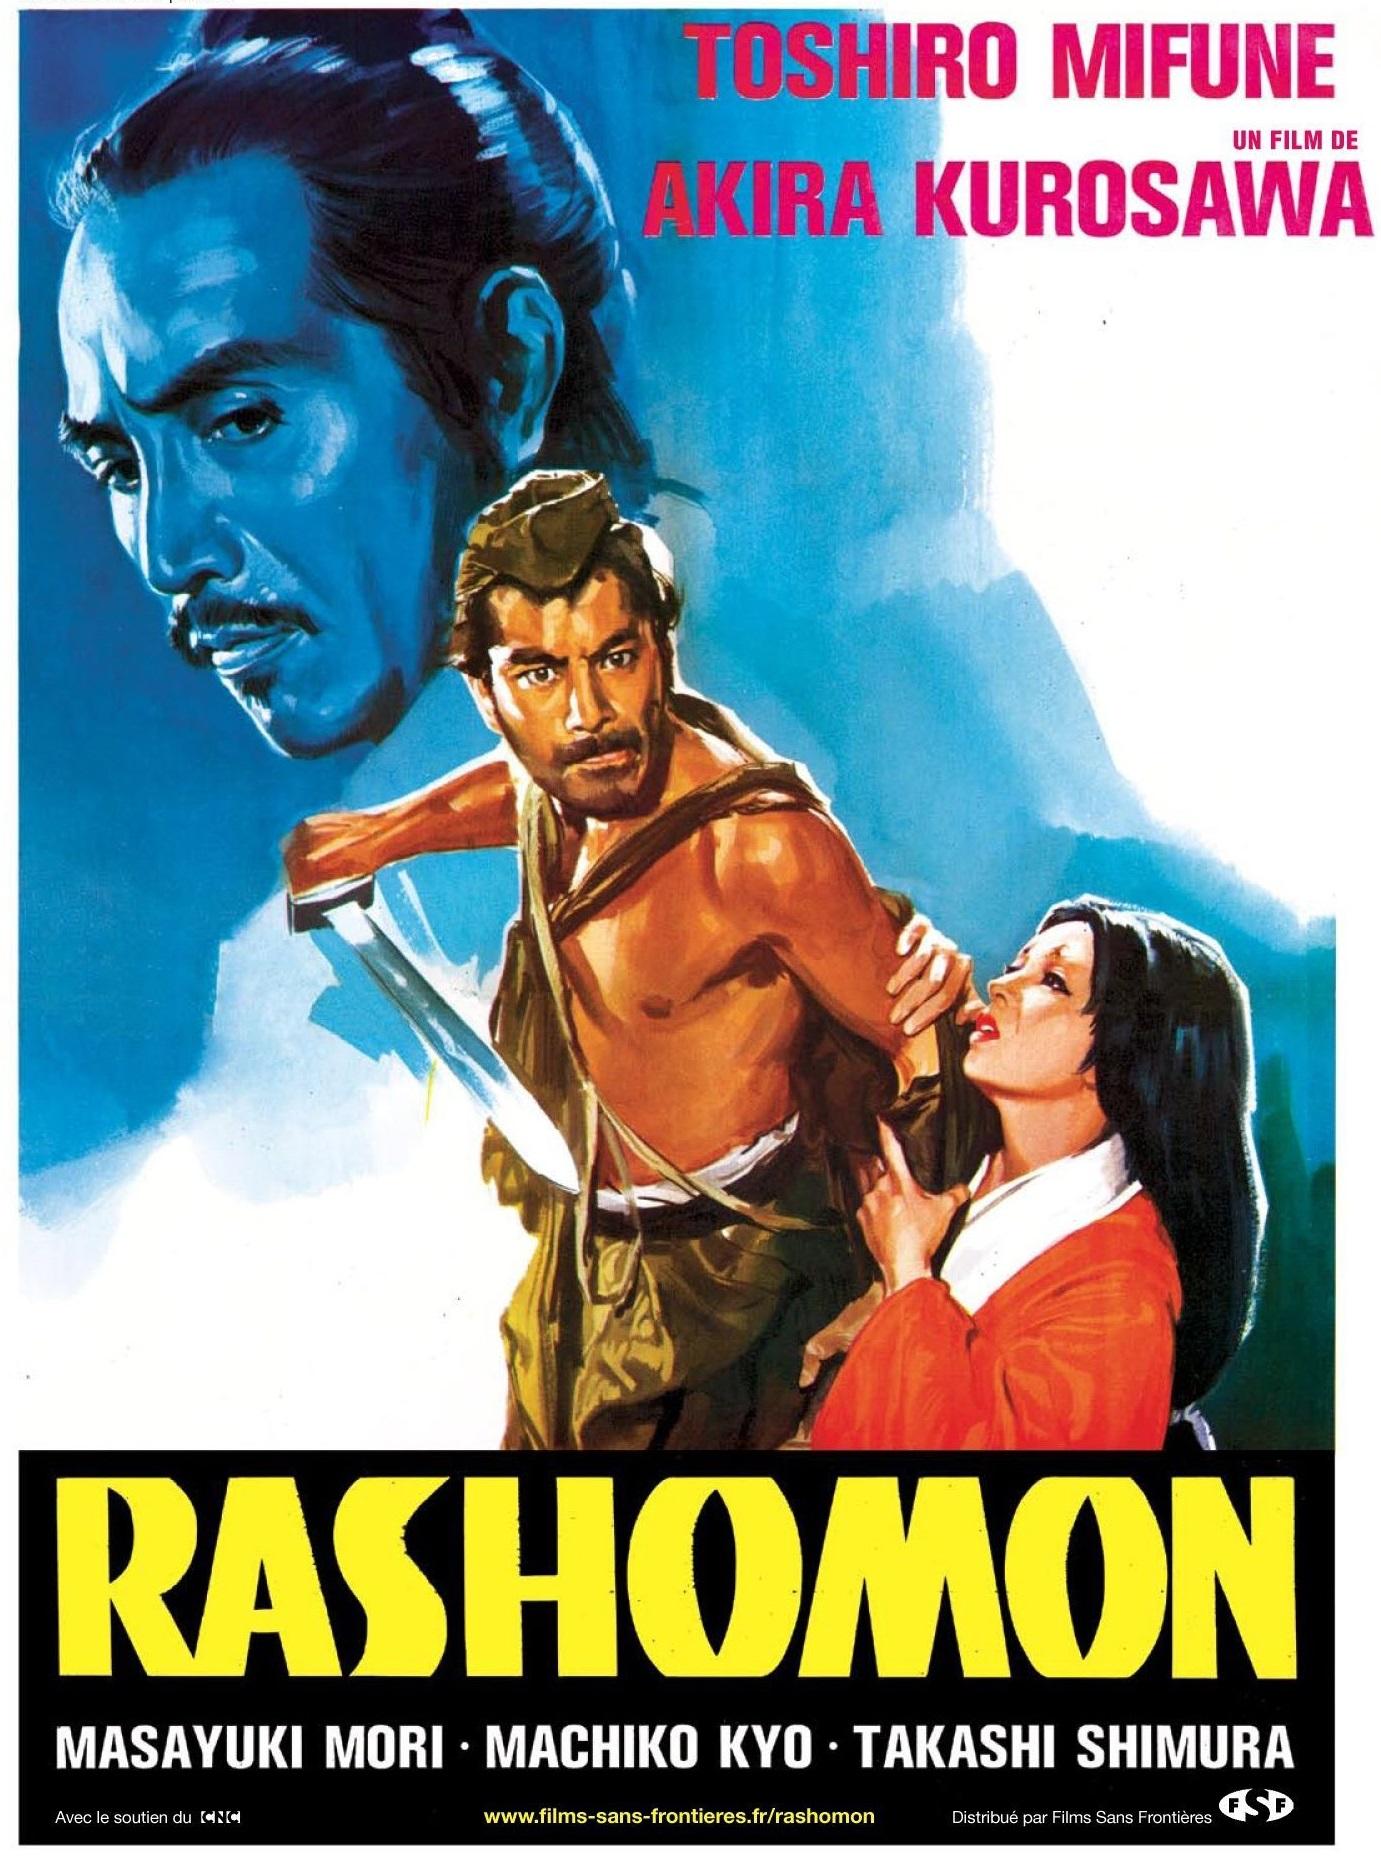 rashomon - kurosawa